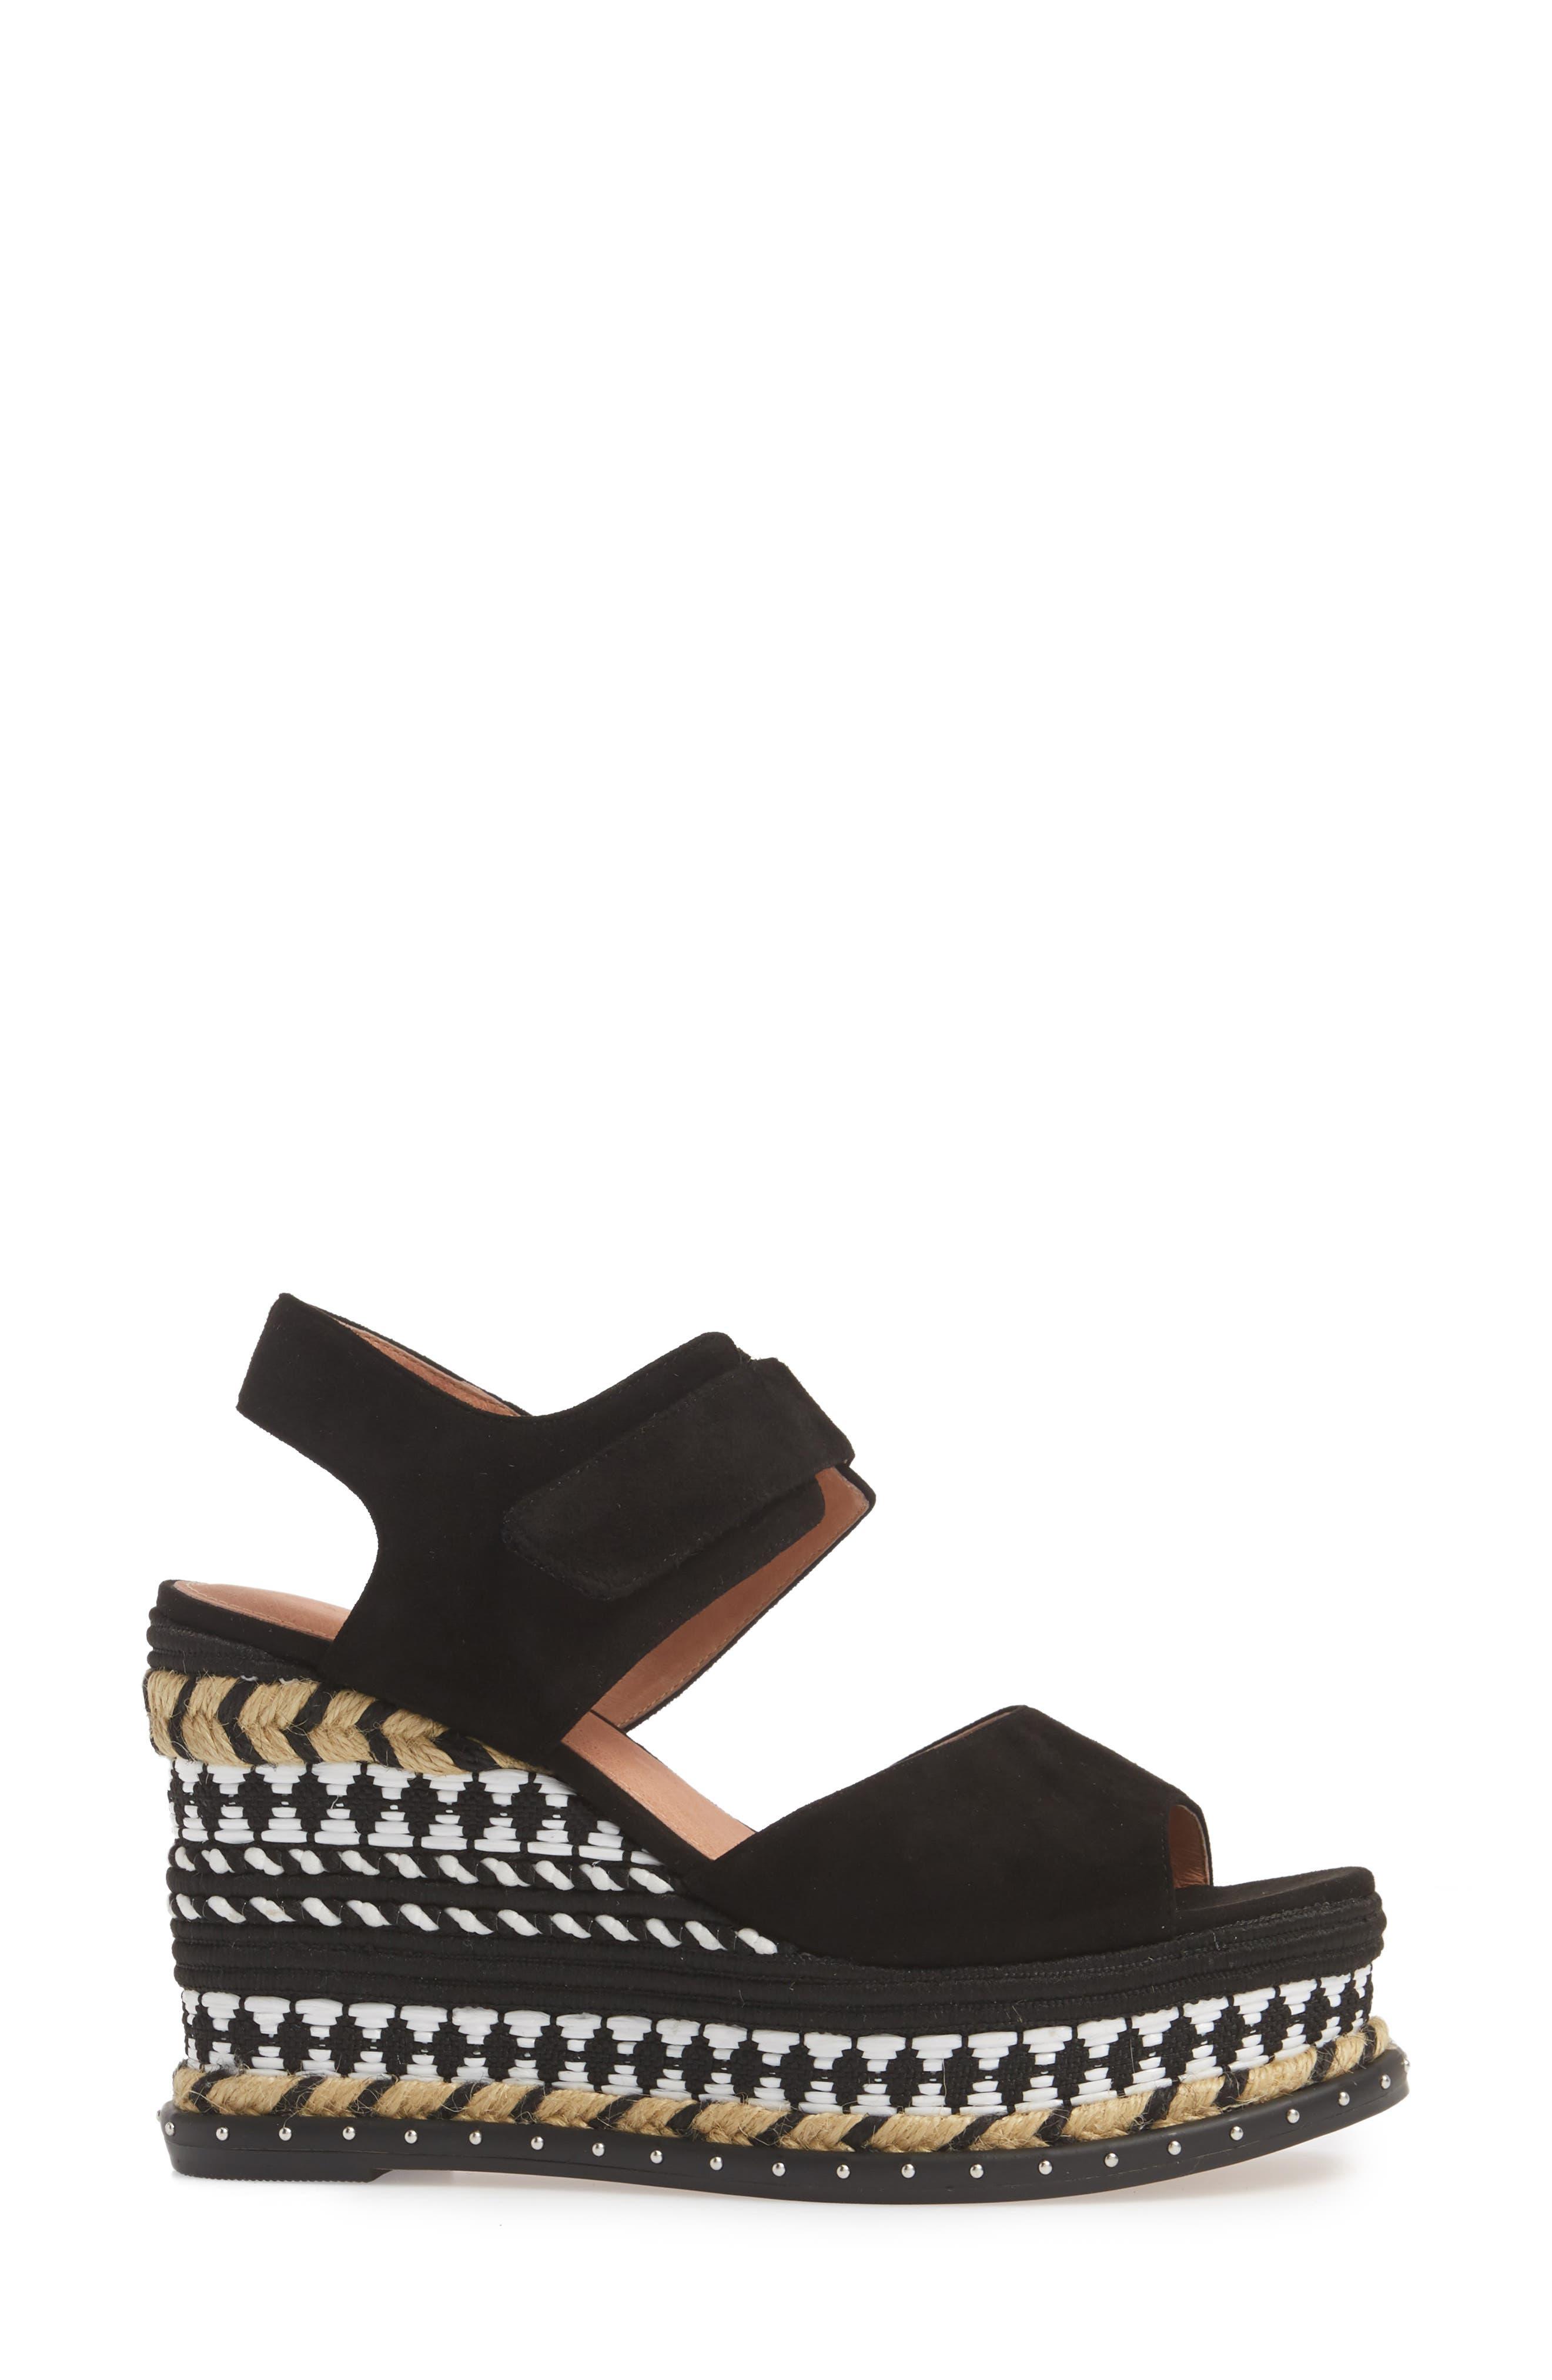 Braxton Platform Wedge Sandal,                             Alternate thumbnail 3, color,                             001